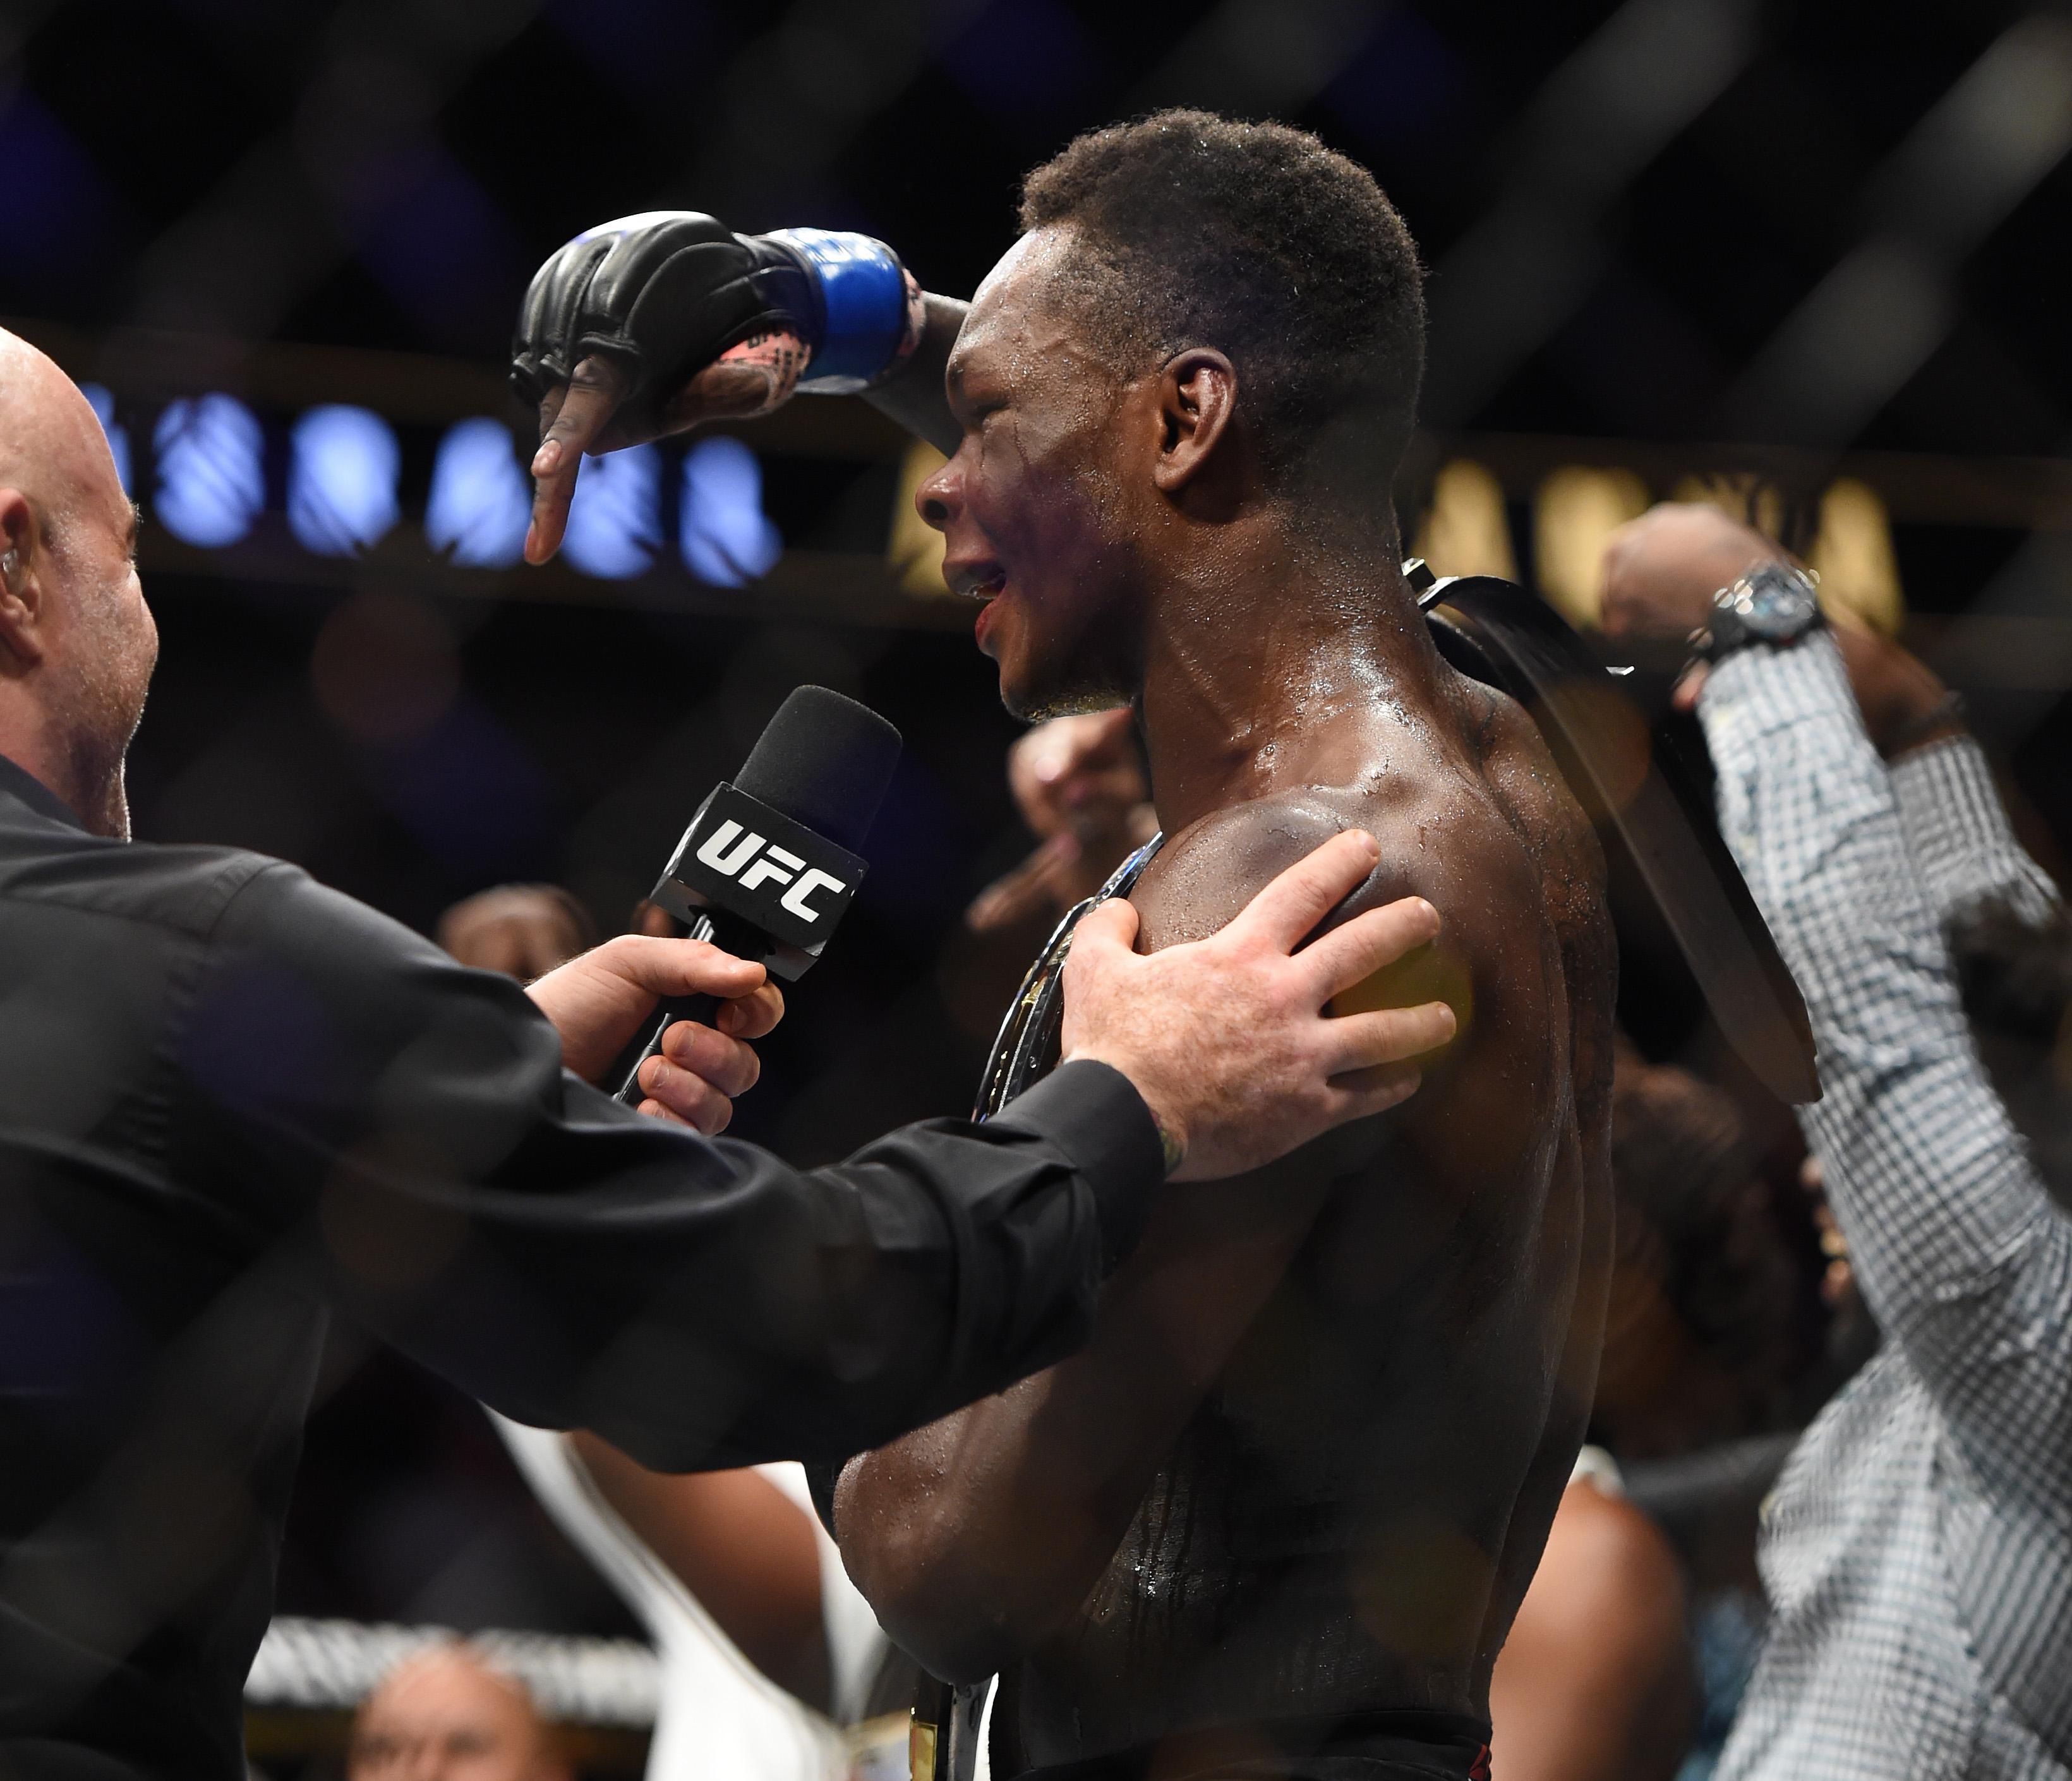 MMA: UFC 236- Gastelum vs Adesanya